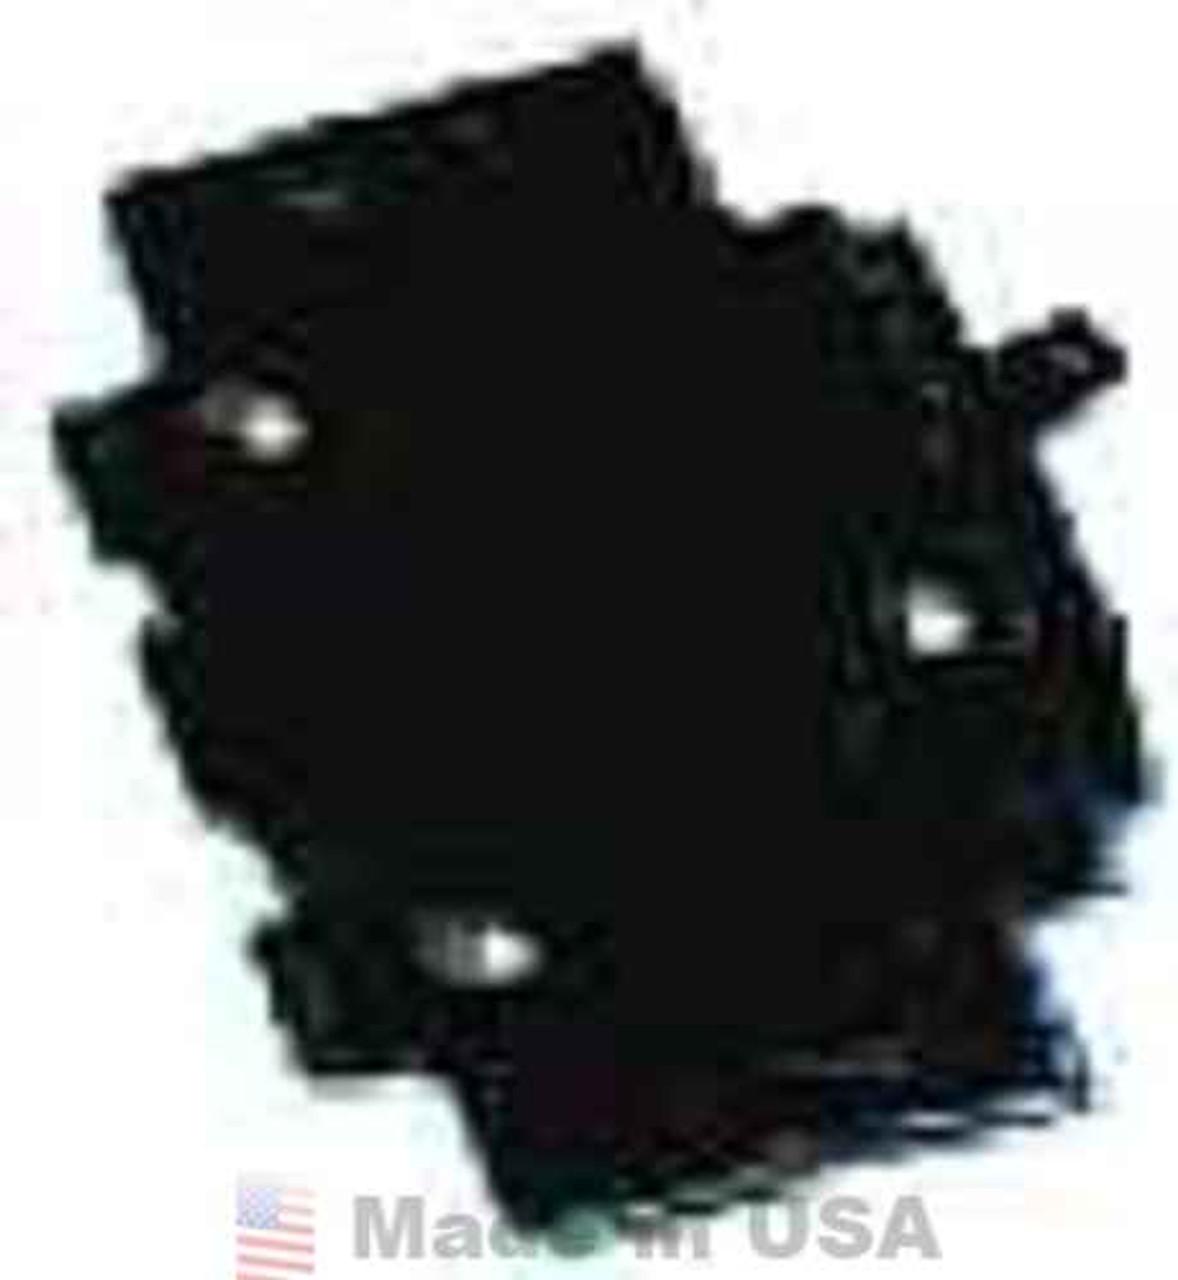 Outback 10A 277V AC 50/60Hz Single Pole Breaker, 0.5in